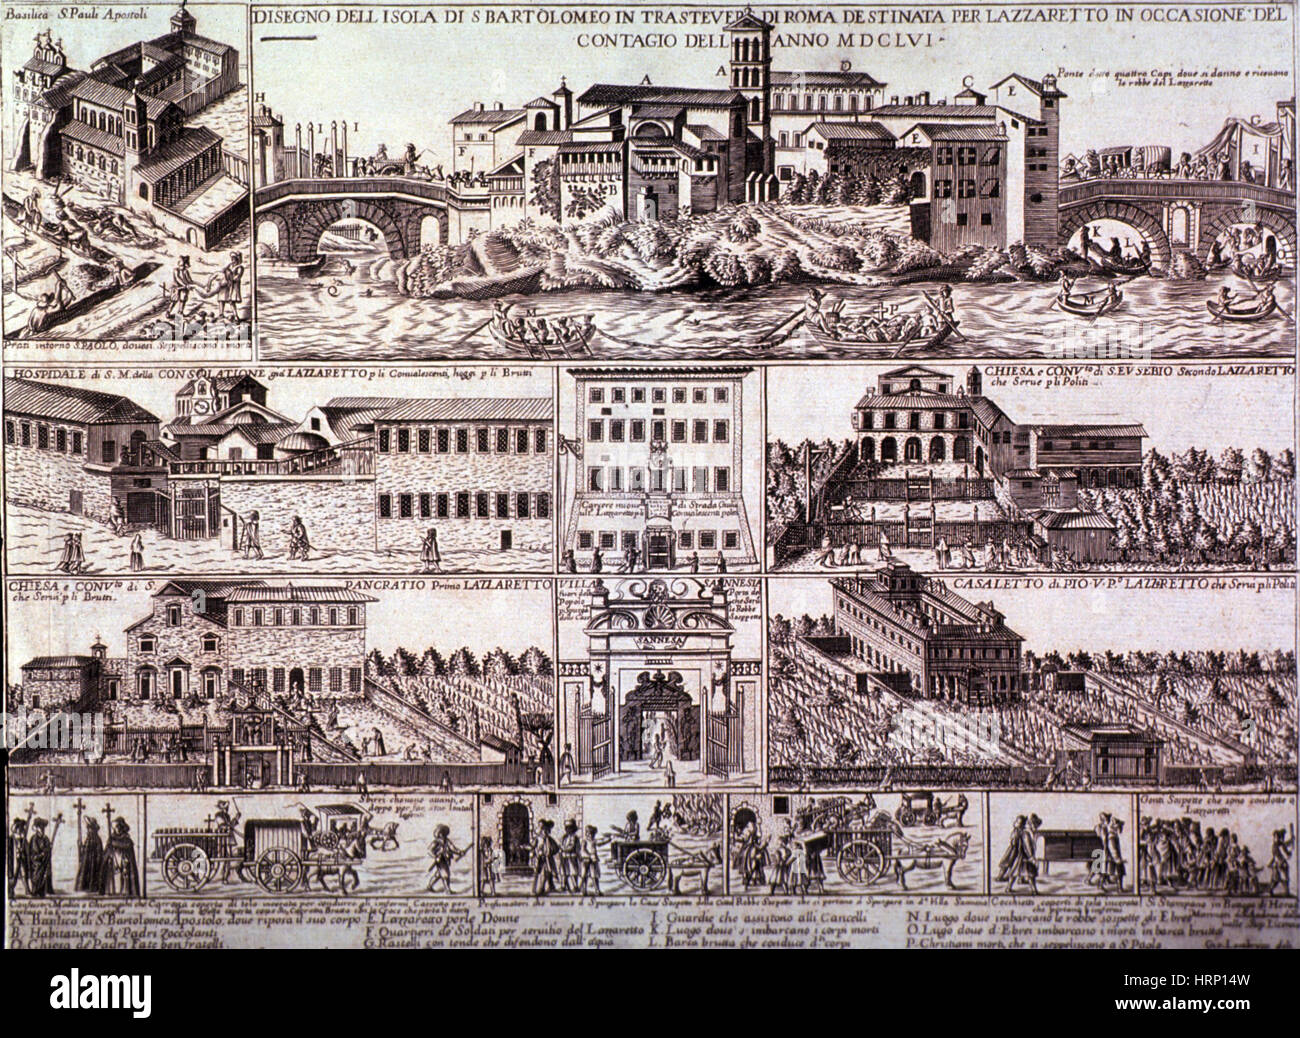 Rome Plague, 1656 - Stock Image